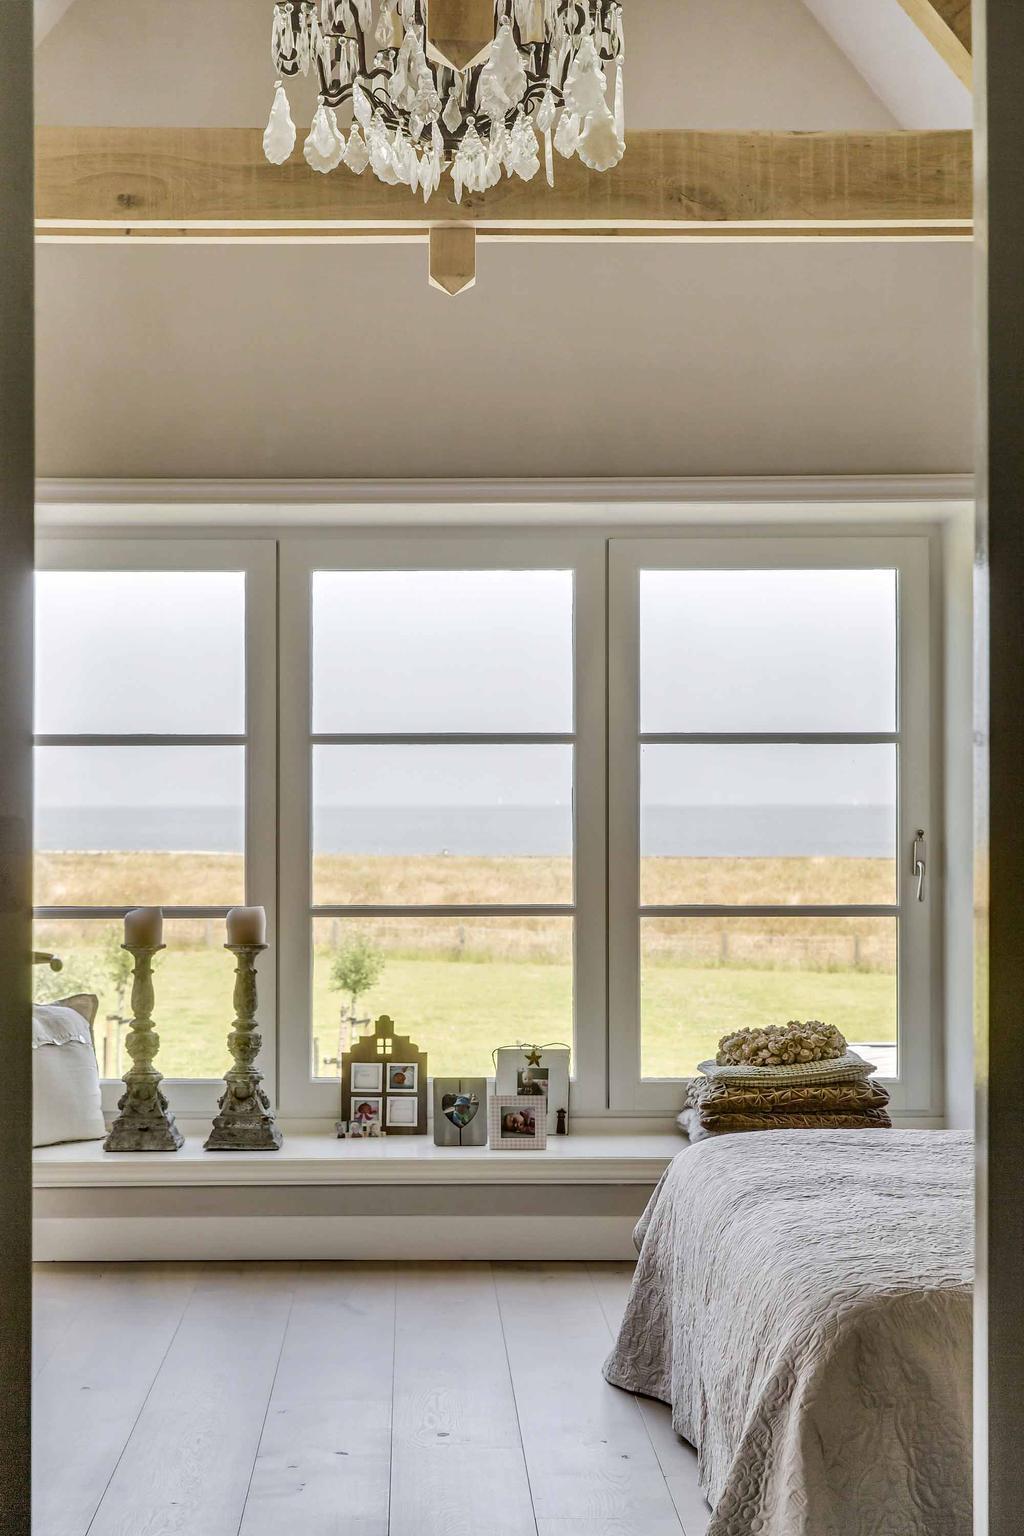 slaapkamer uitzicht vensterbank